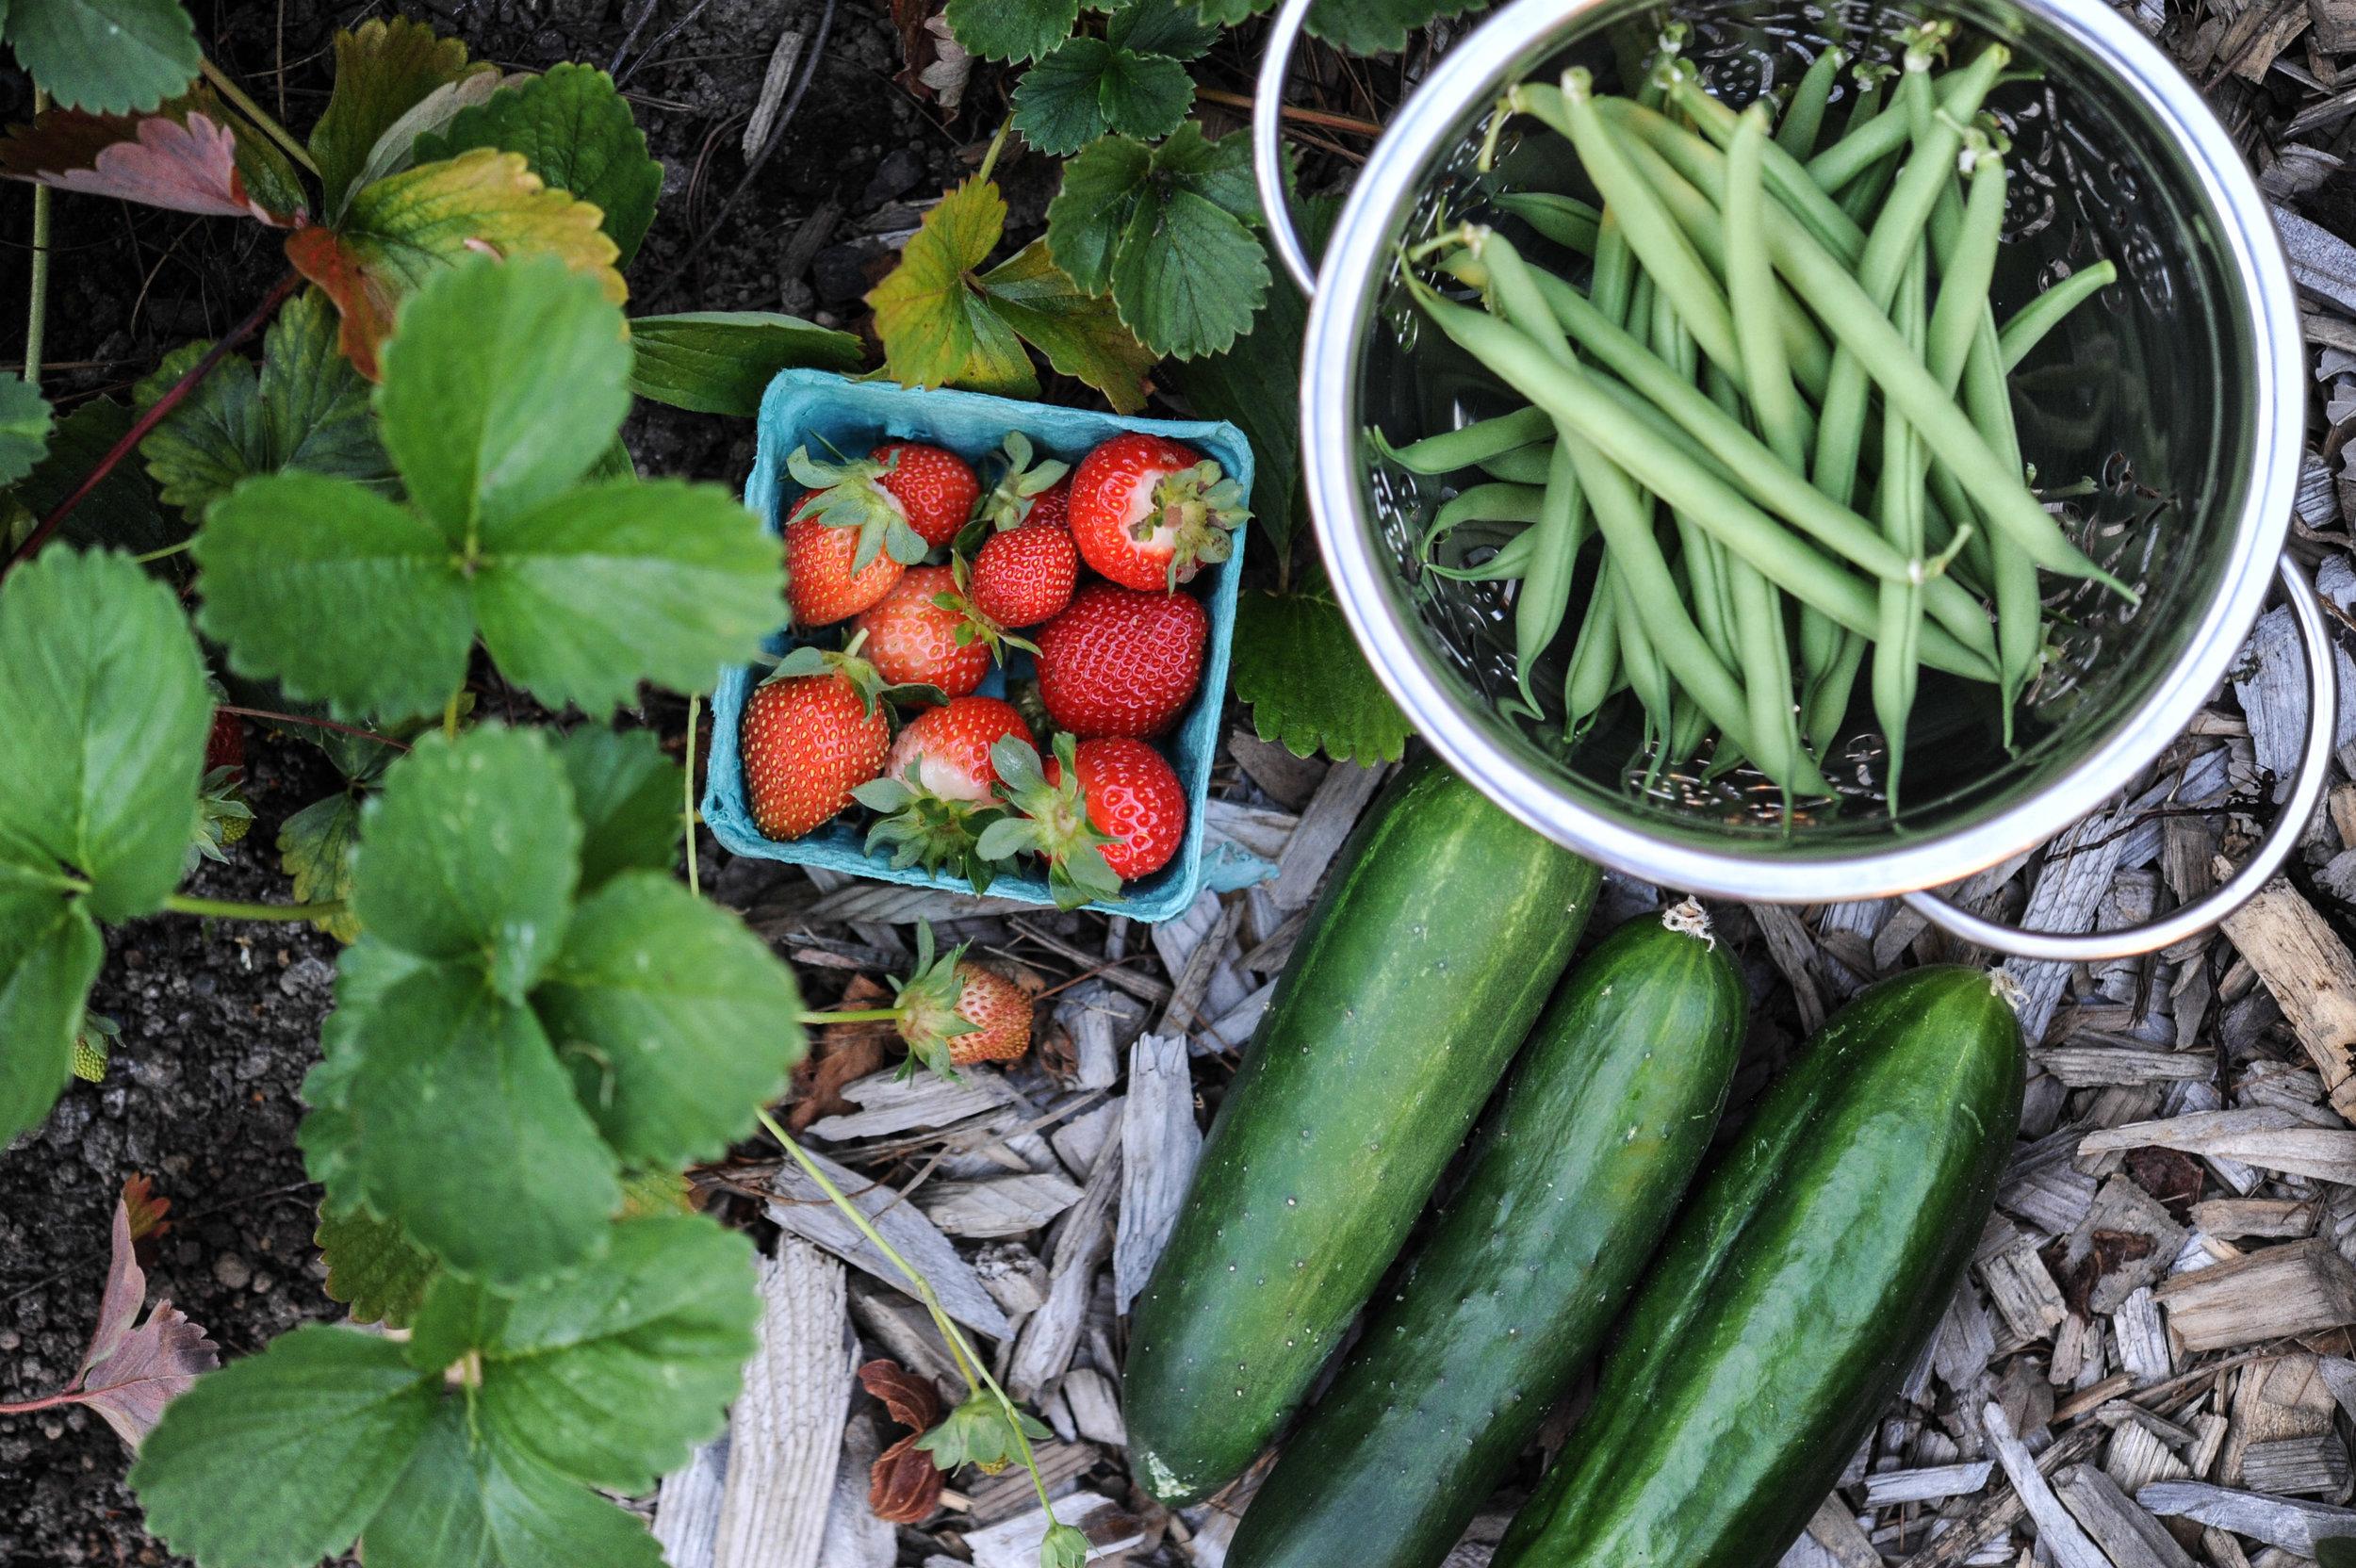 Cucumbers_EBpodcast_Seattle Urban Farm Co